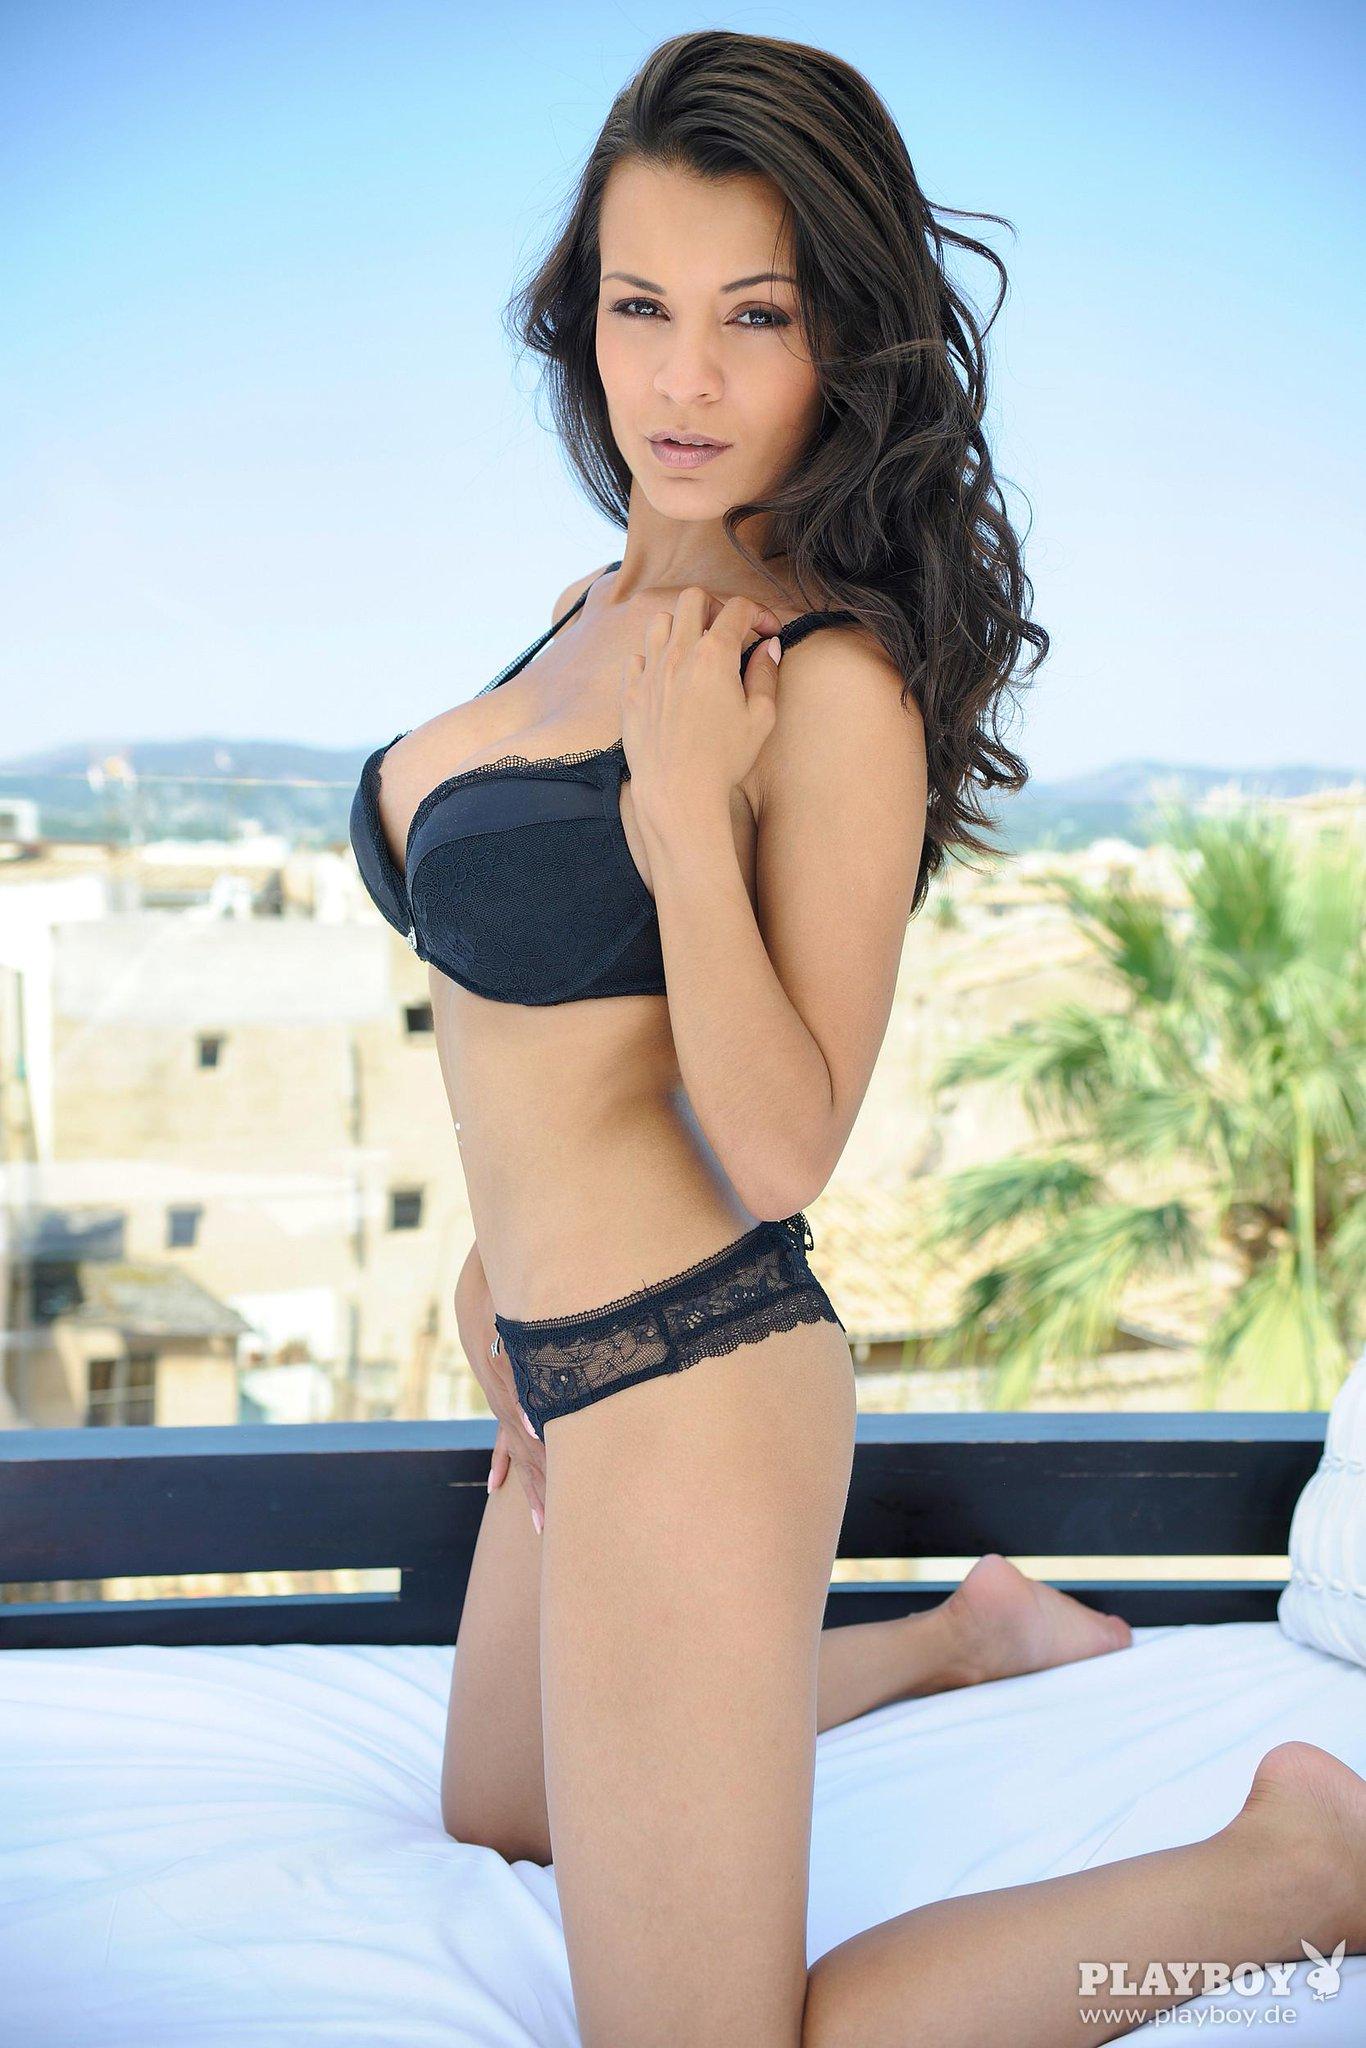 Playboy bilder plankl joana Joana Plankl